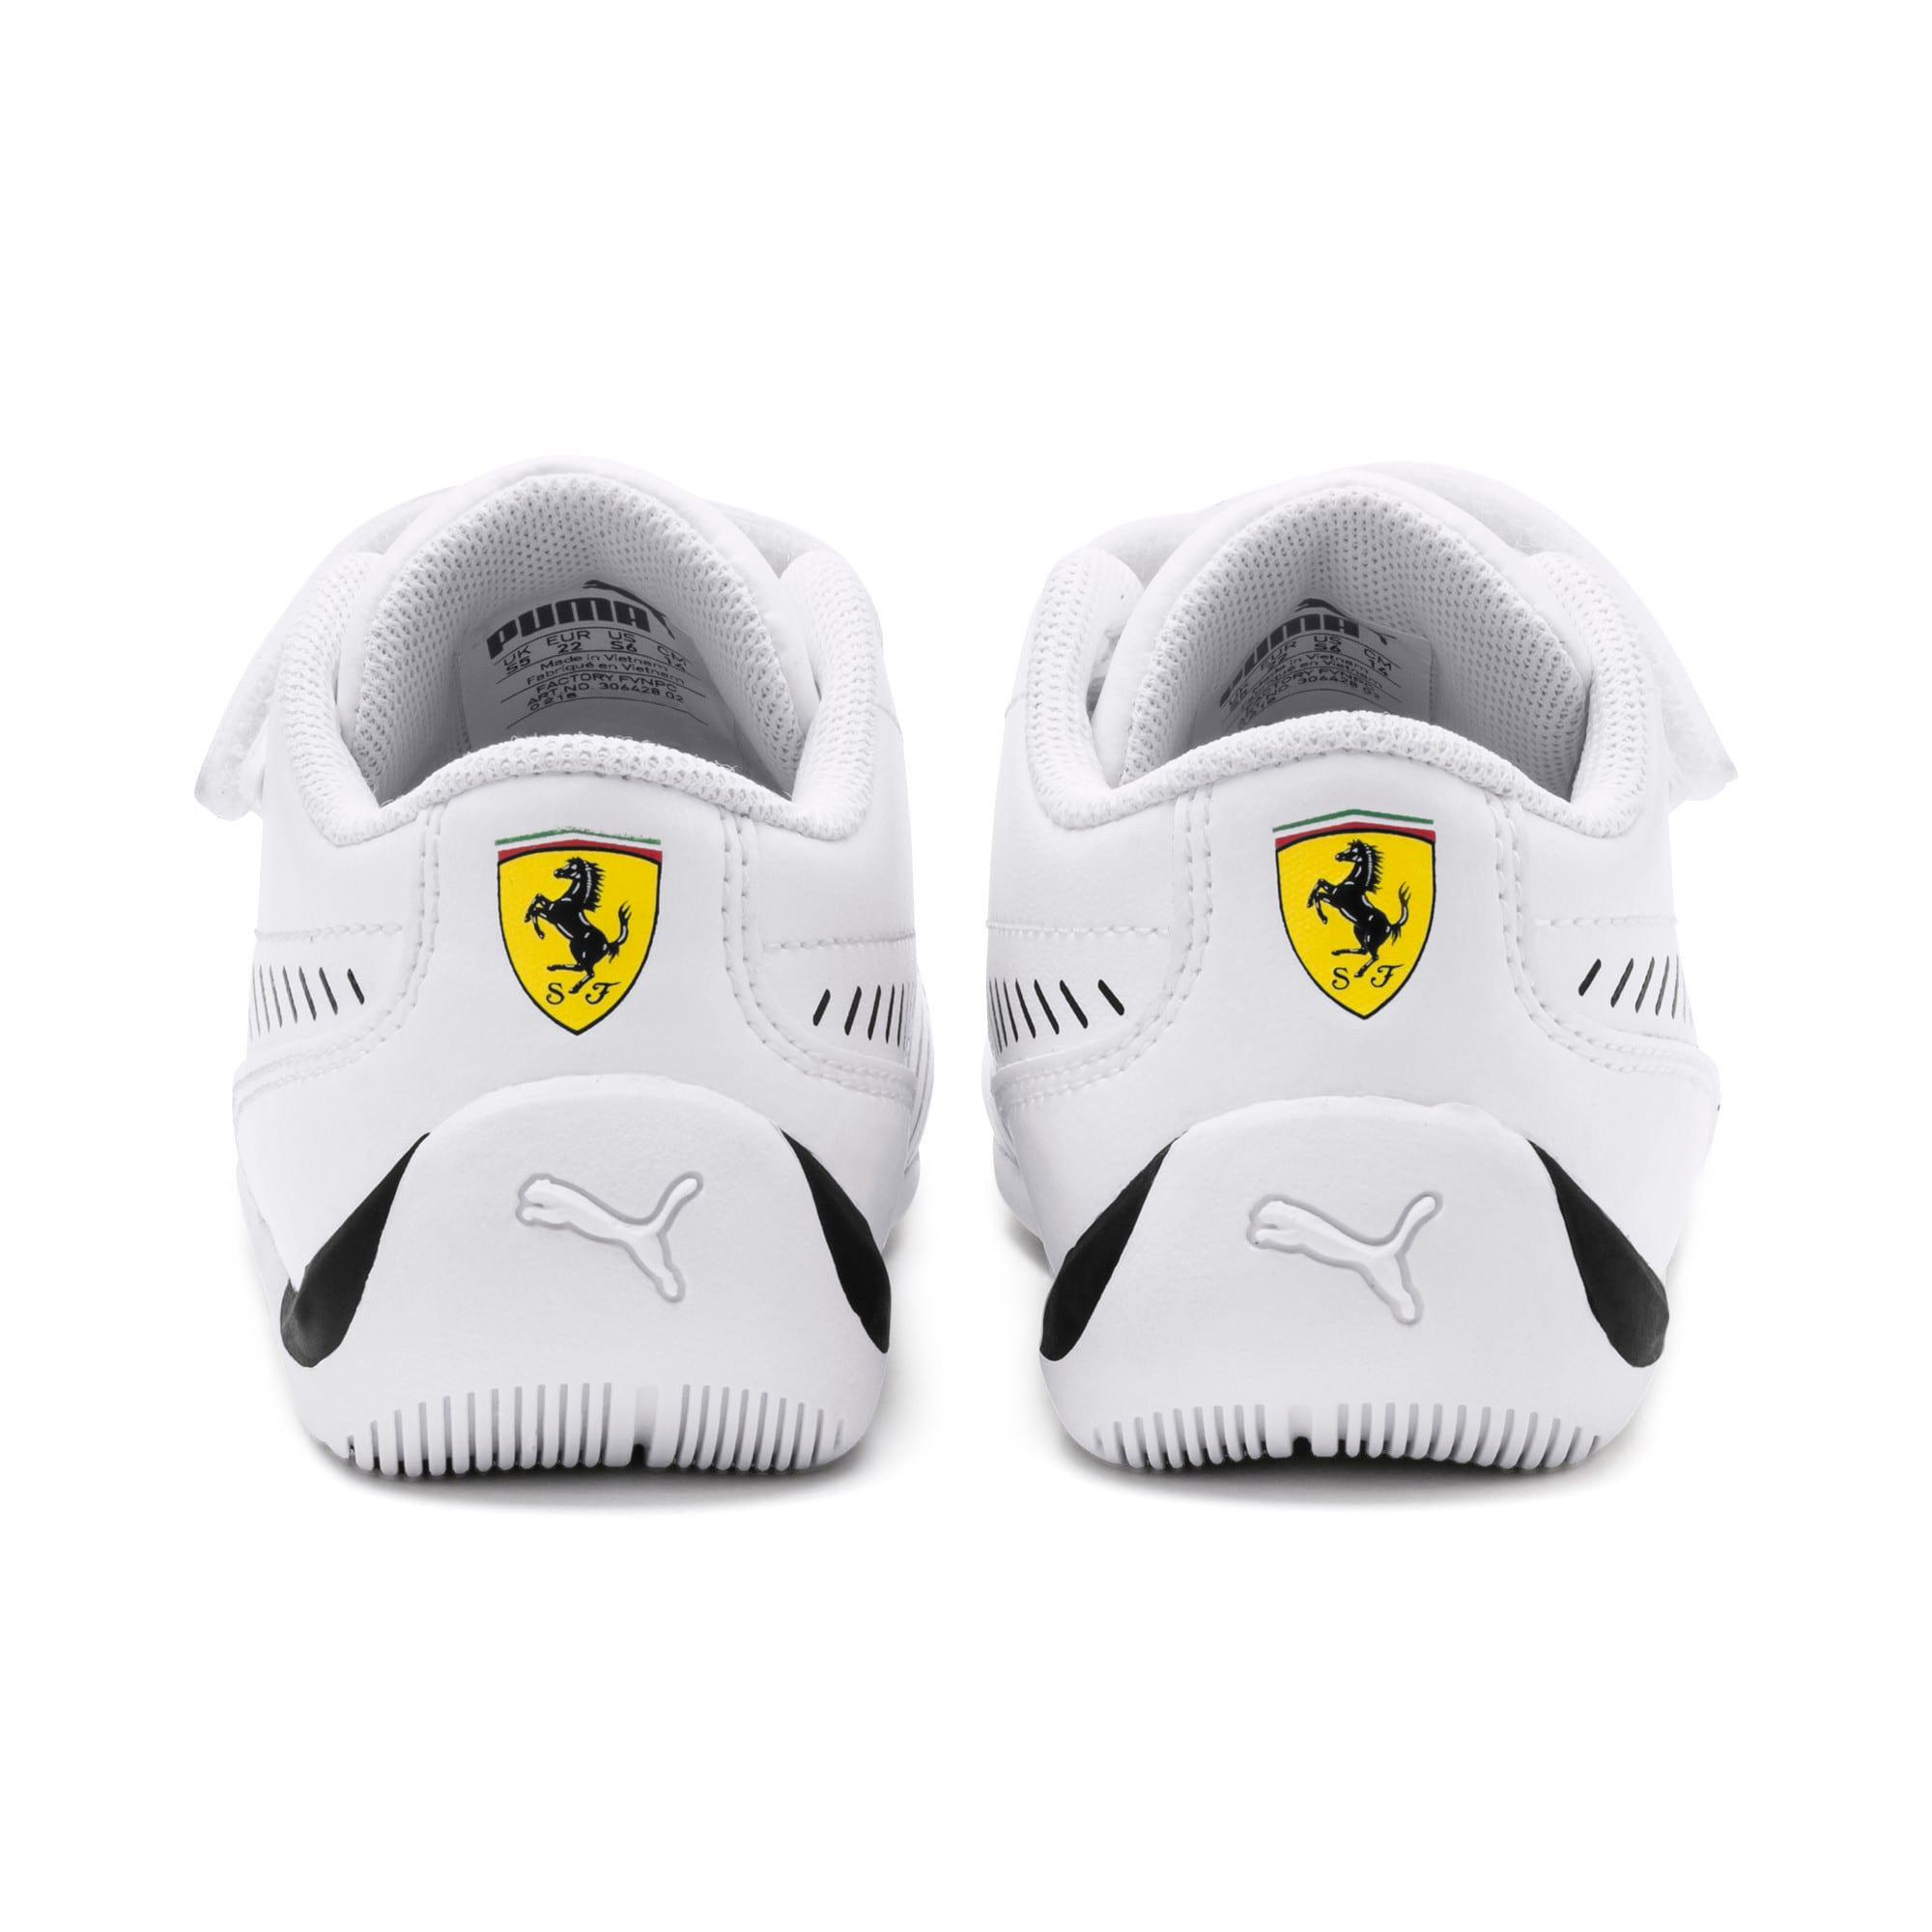 Thumbnail 3 of Ferrari Drift Cat 7S Ultra Kids' Trainers, Puma White-Puma Black, medium-IND